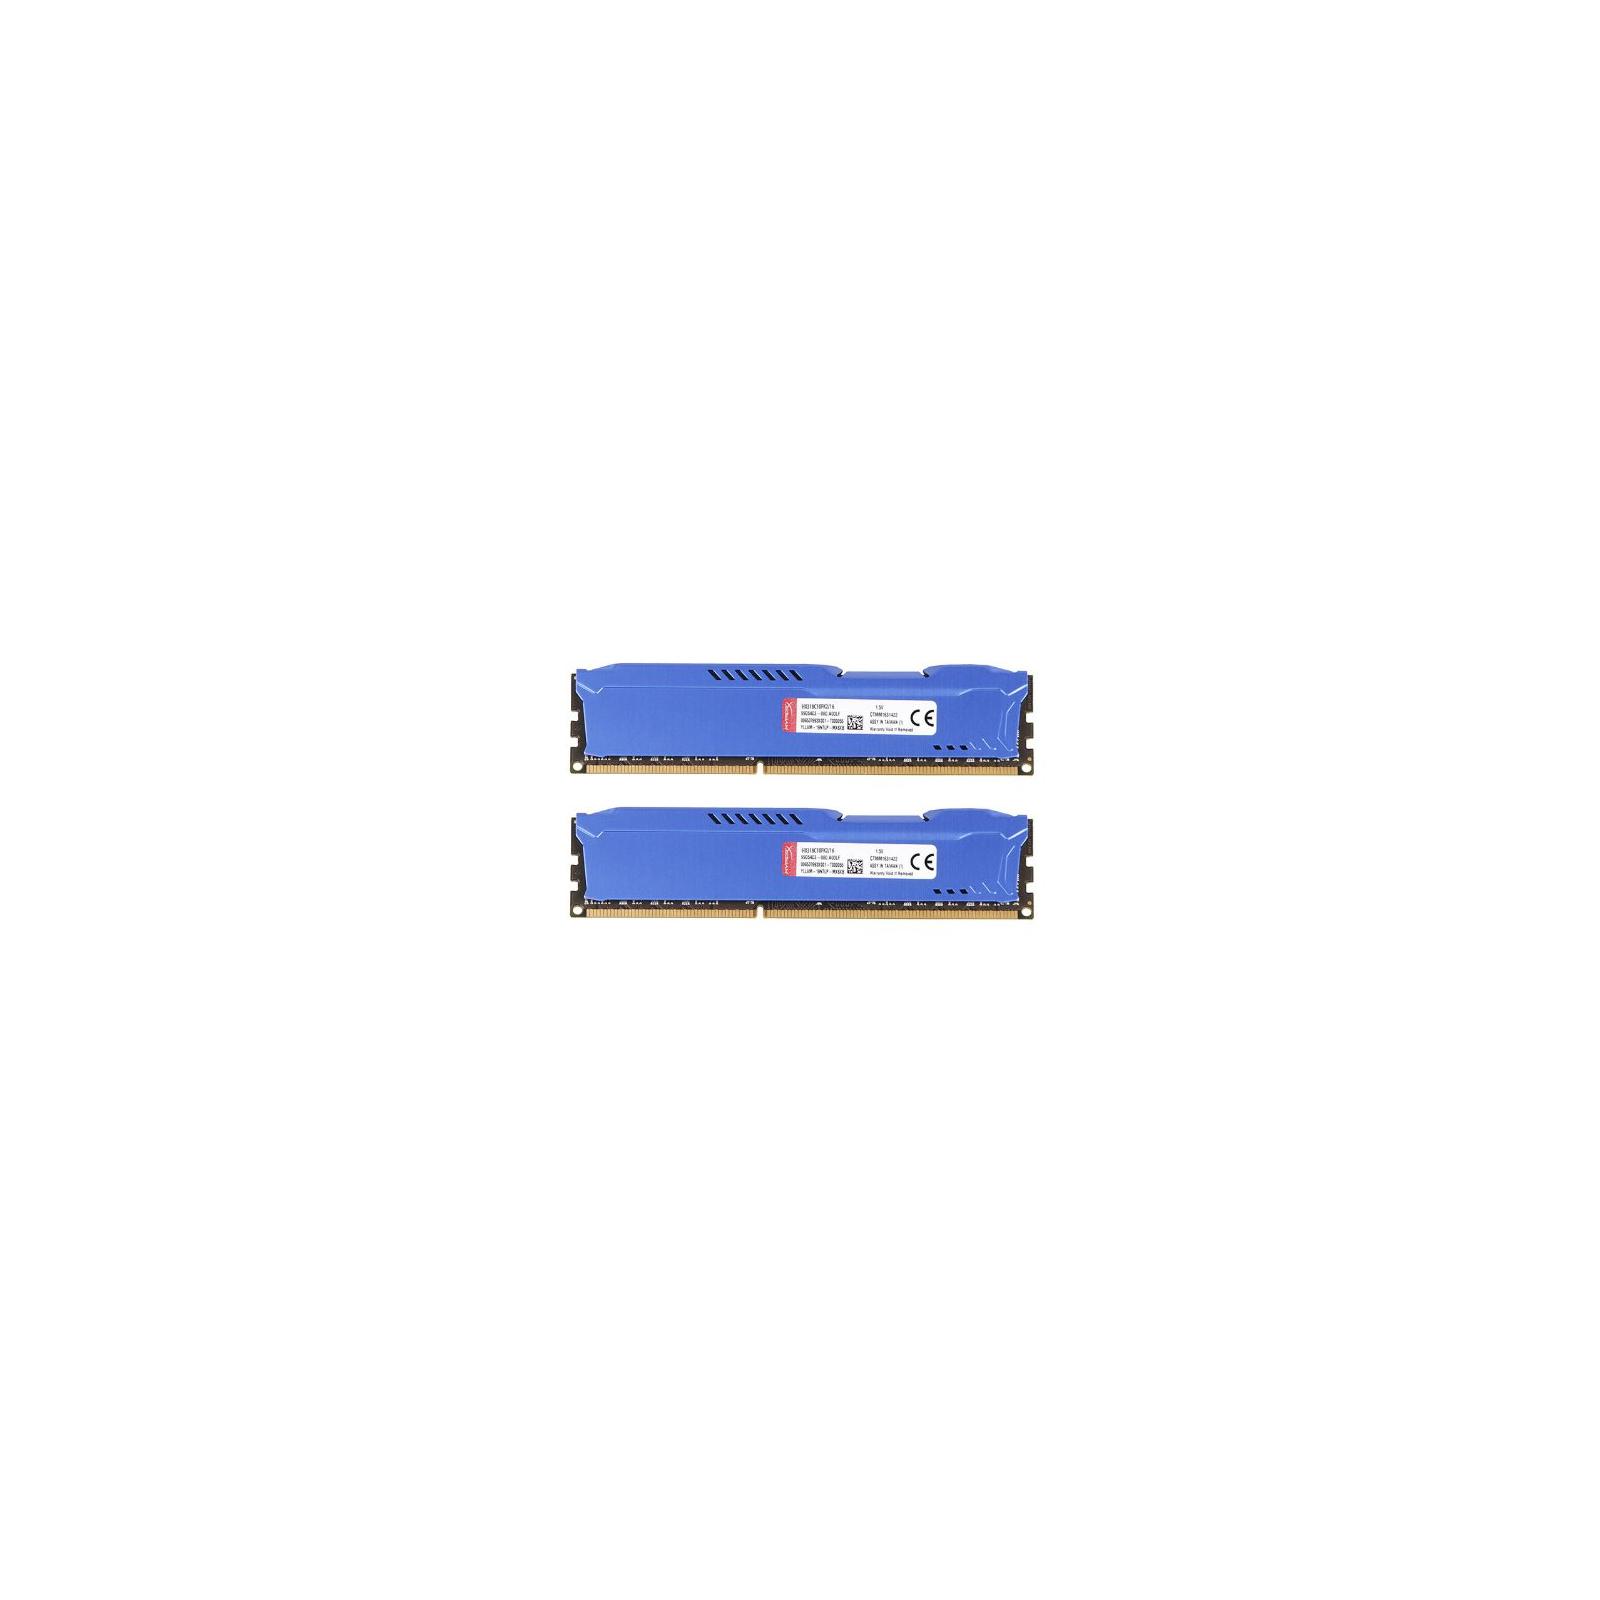 Модуль памяти для компьютера DDR3 8Gb (2x4GB) 1600 MHz HyperX Fury Blu Kingston (HX316C10FK2/8) изображение 4